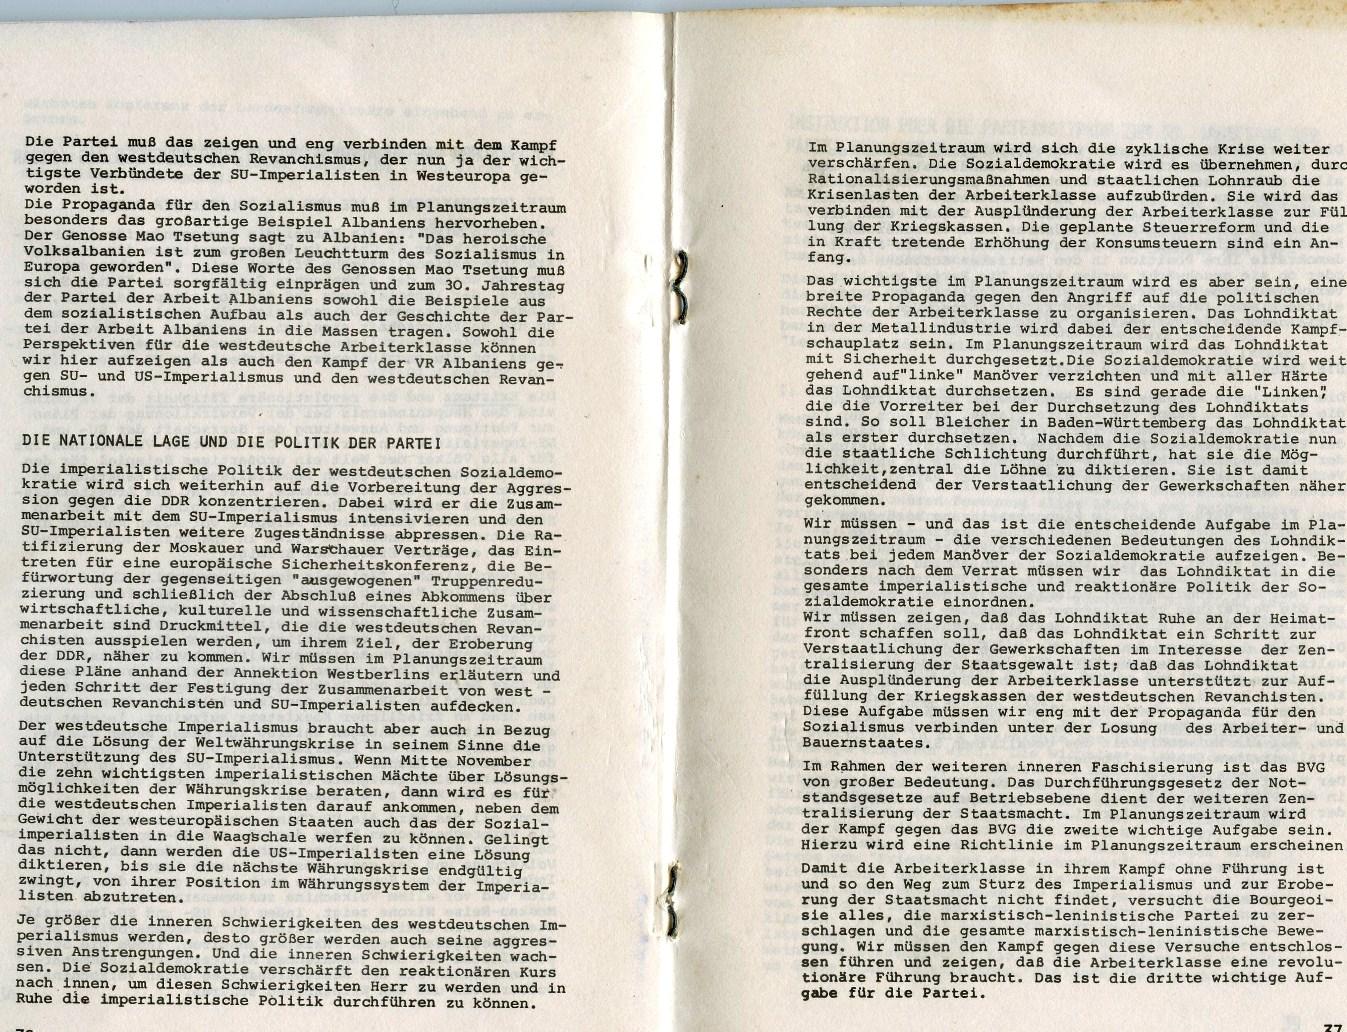 ZB_Parteiarbeiter_1971_09_19